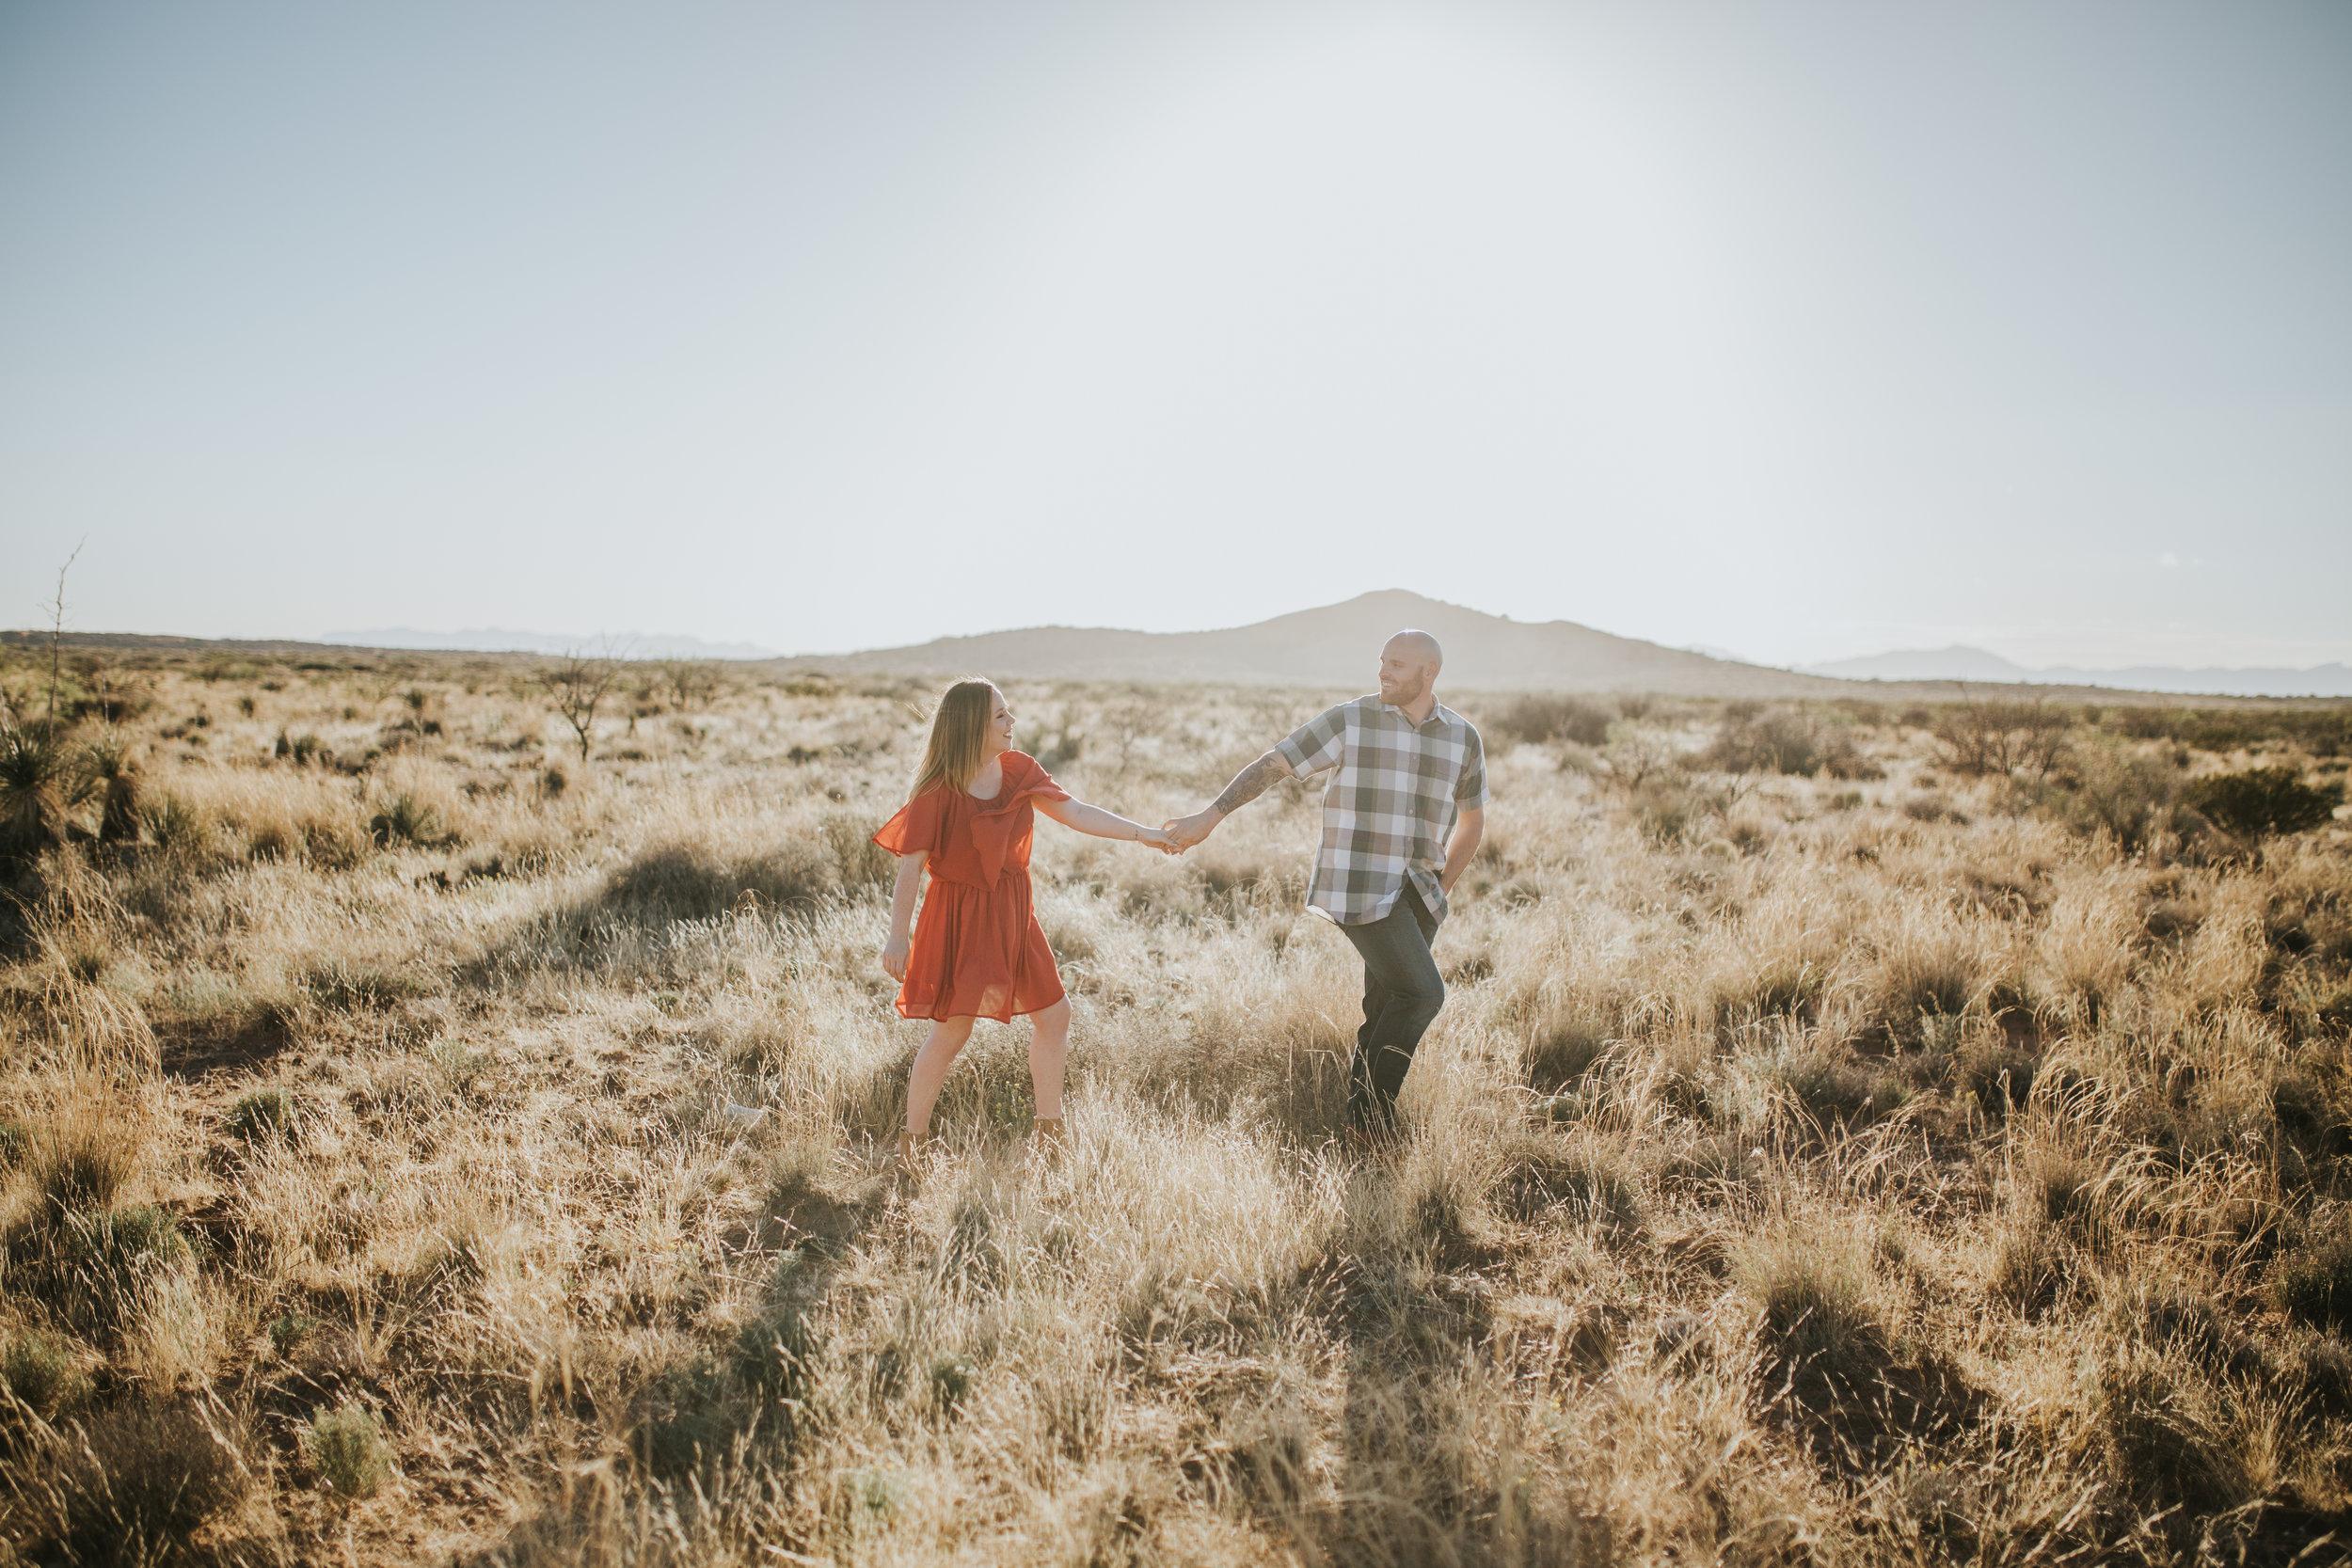 el-paso-elopement-and-wedding-photographer-8